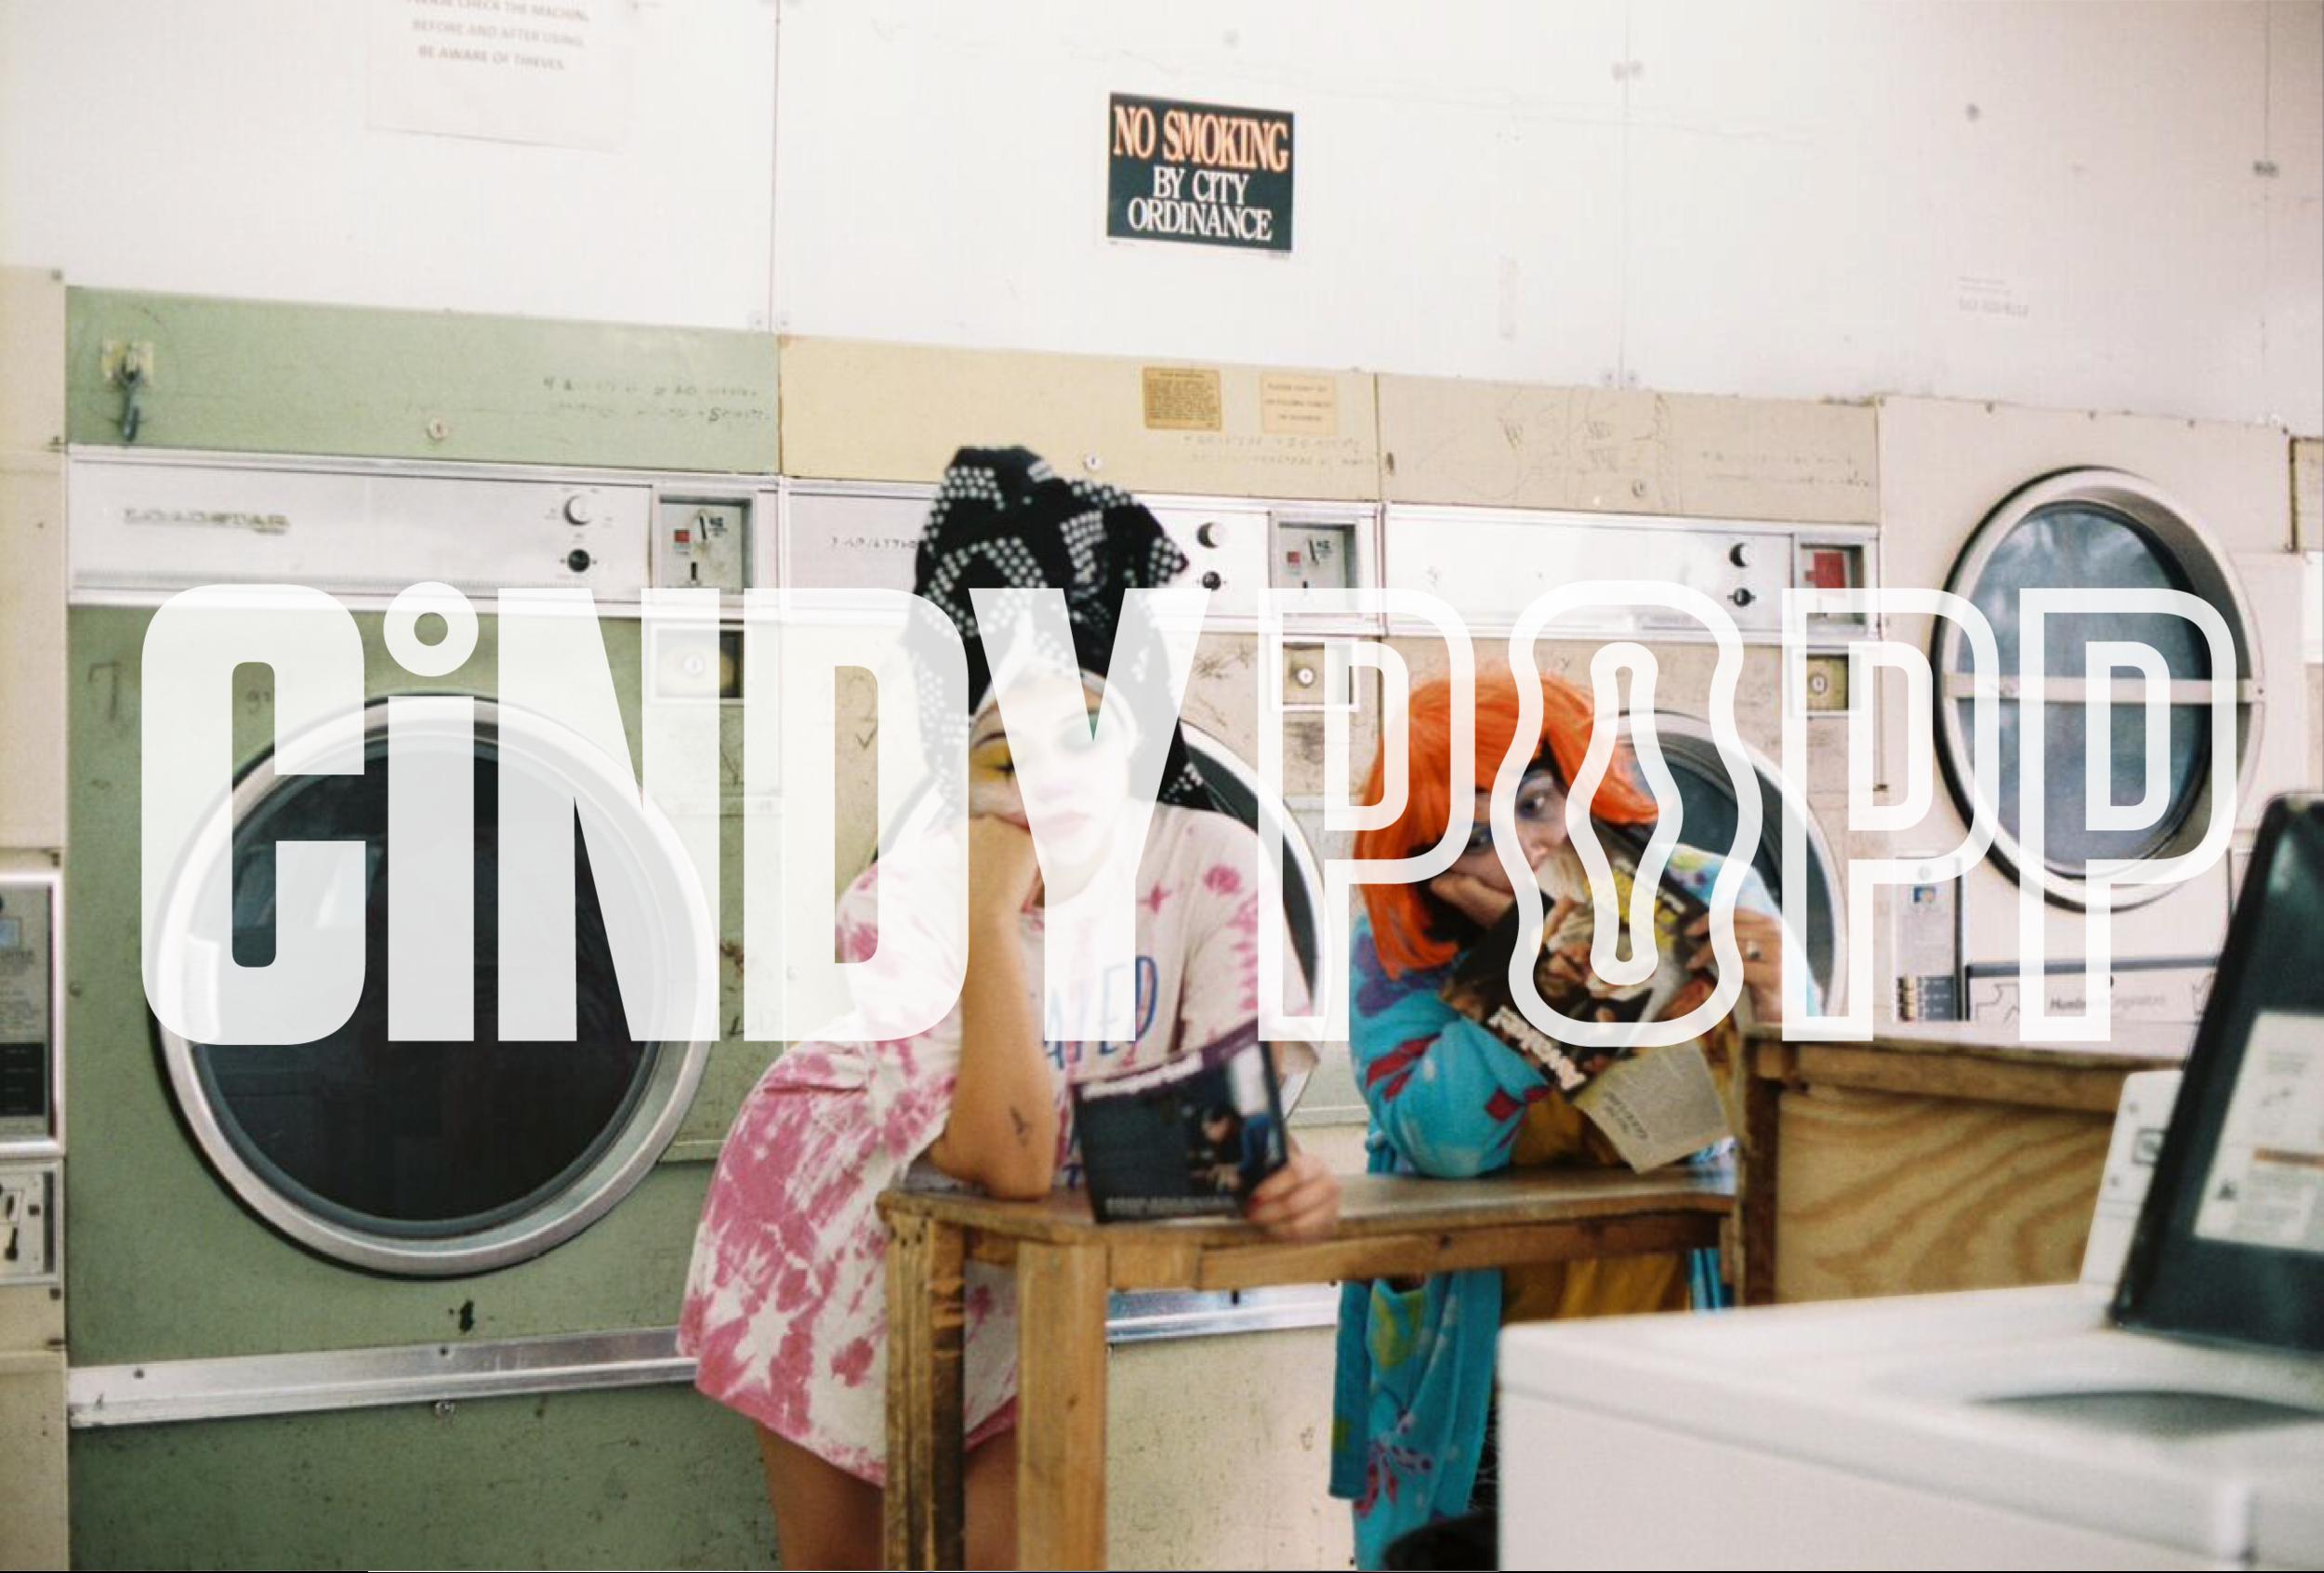 Cindy-Popp-branding-2018-01-01.png